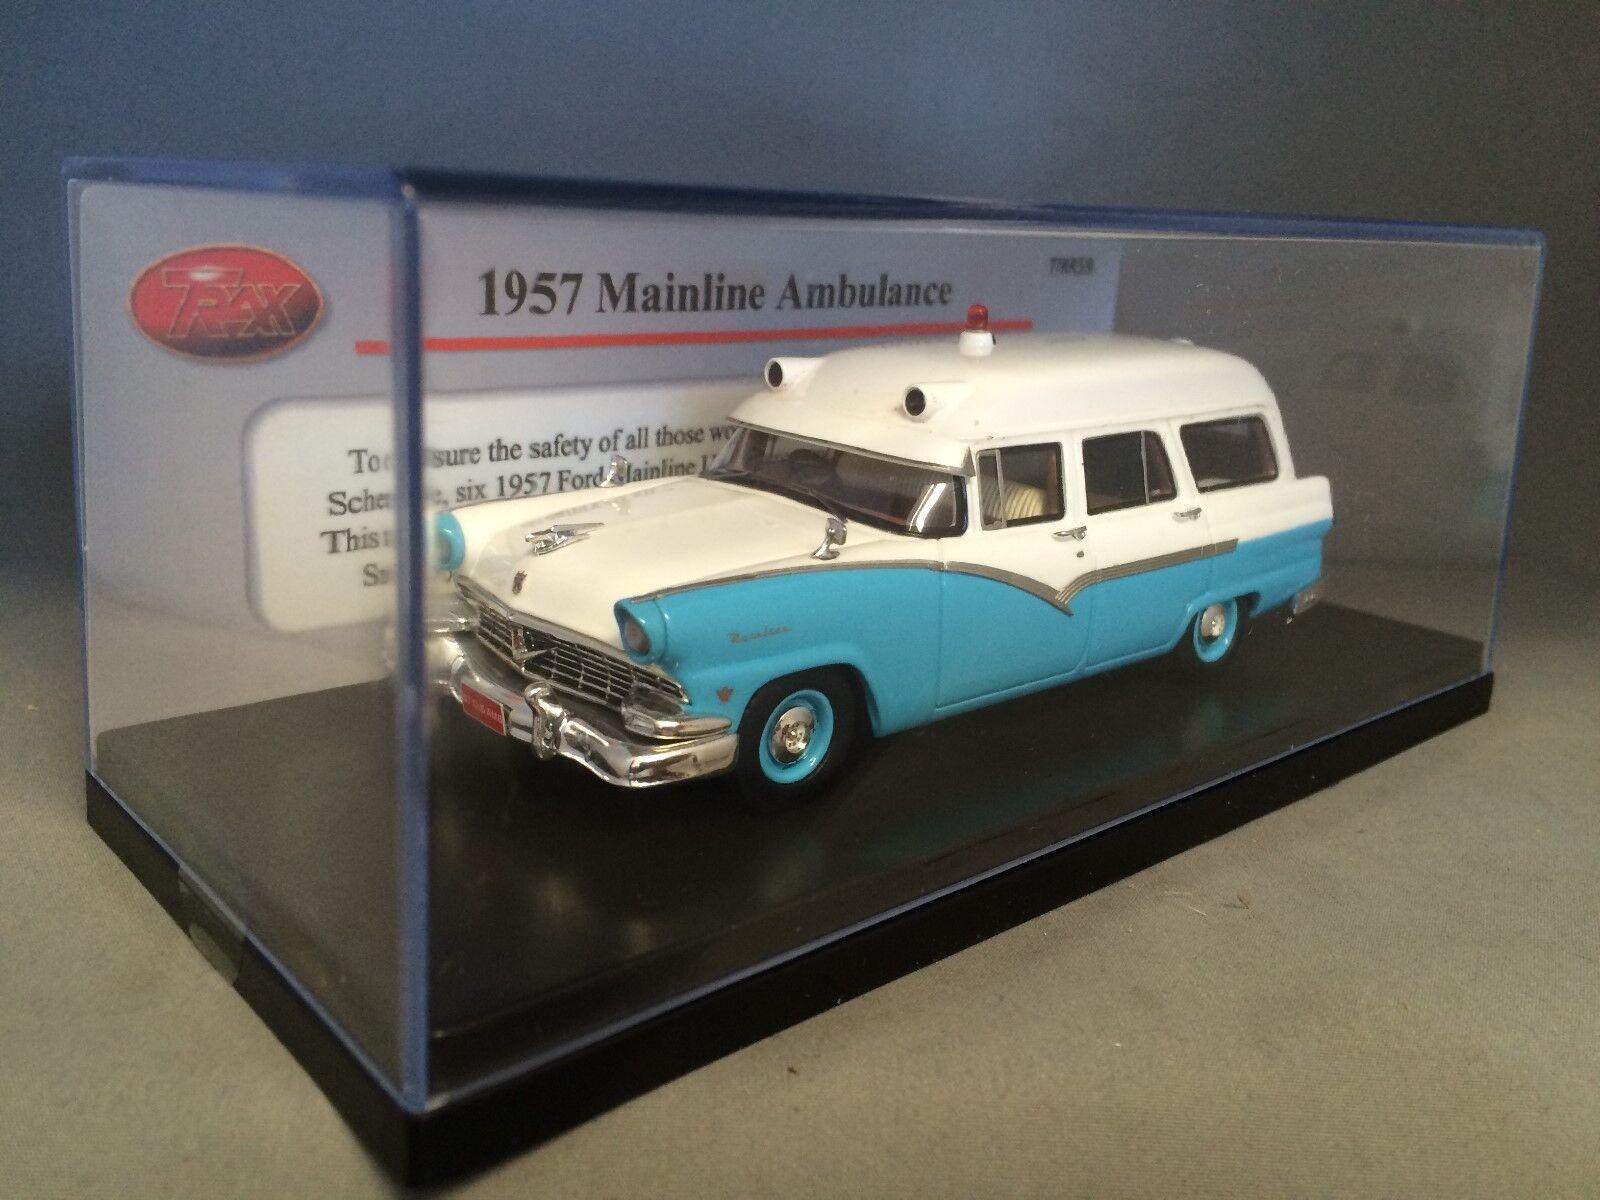 Trax TRR59 1957 Mainline Ambulance